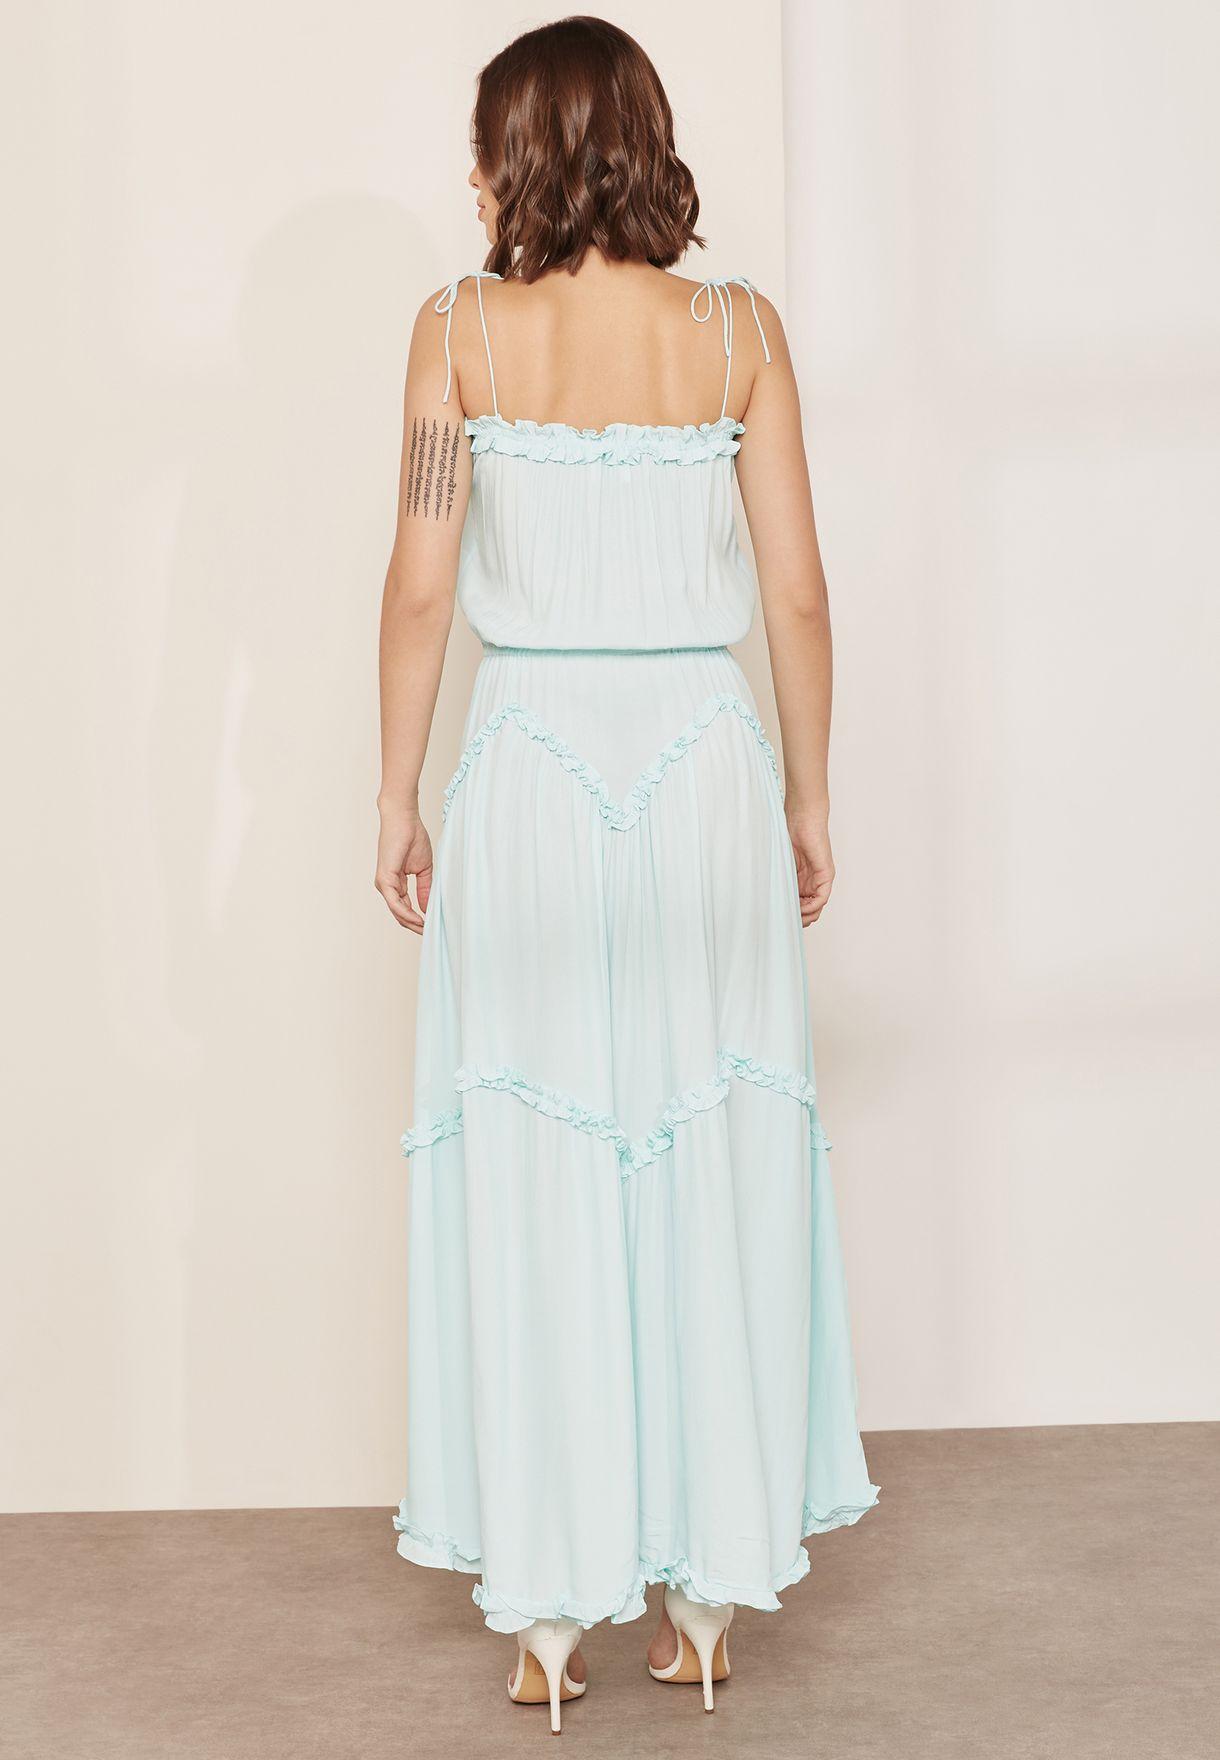 Fare Ruffle Detail Tie Neck Maxi Dress